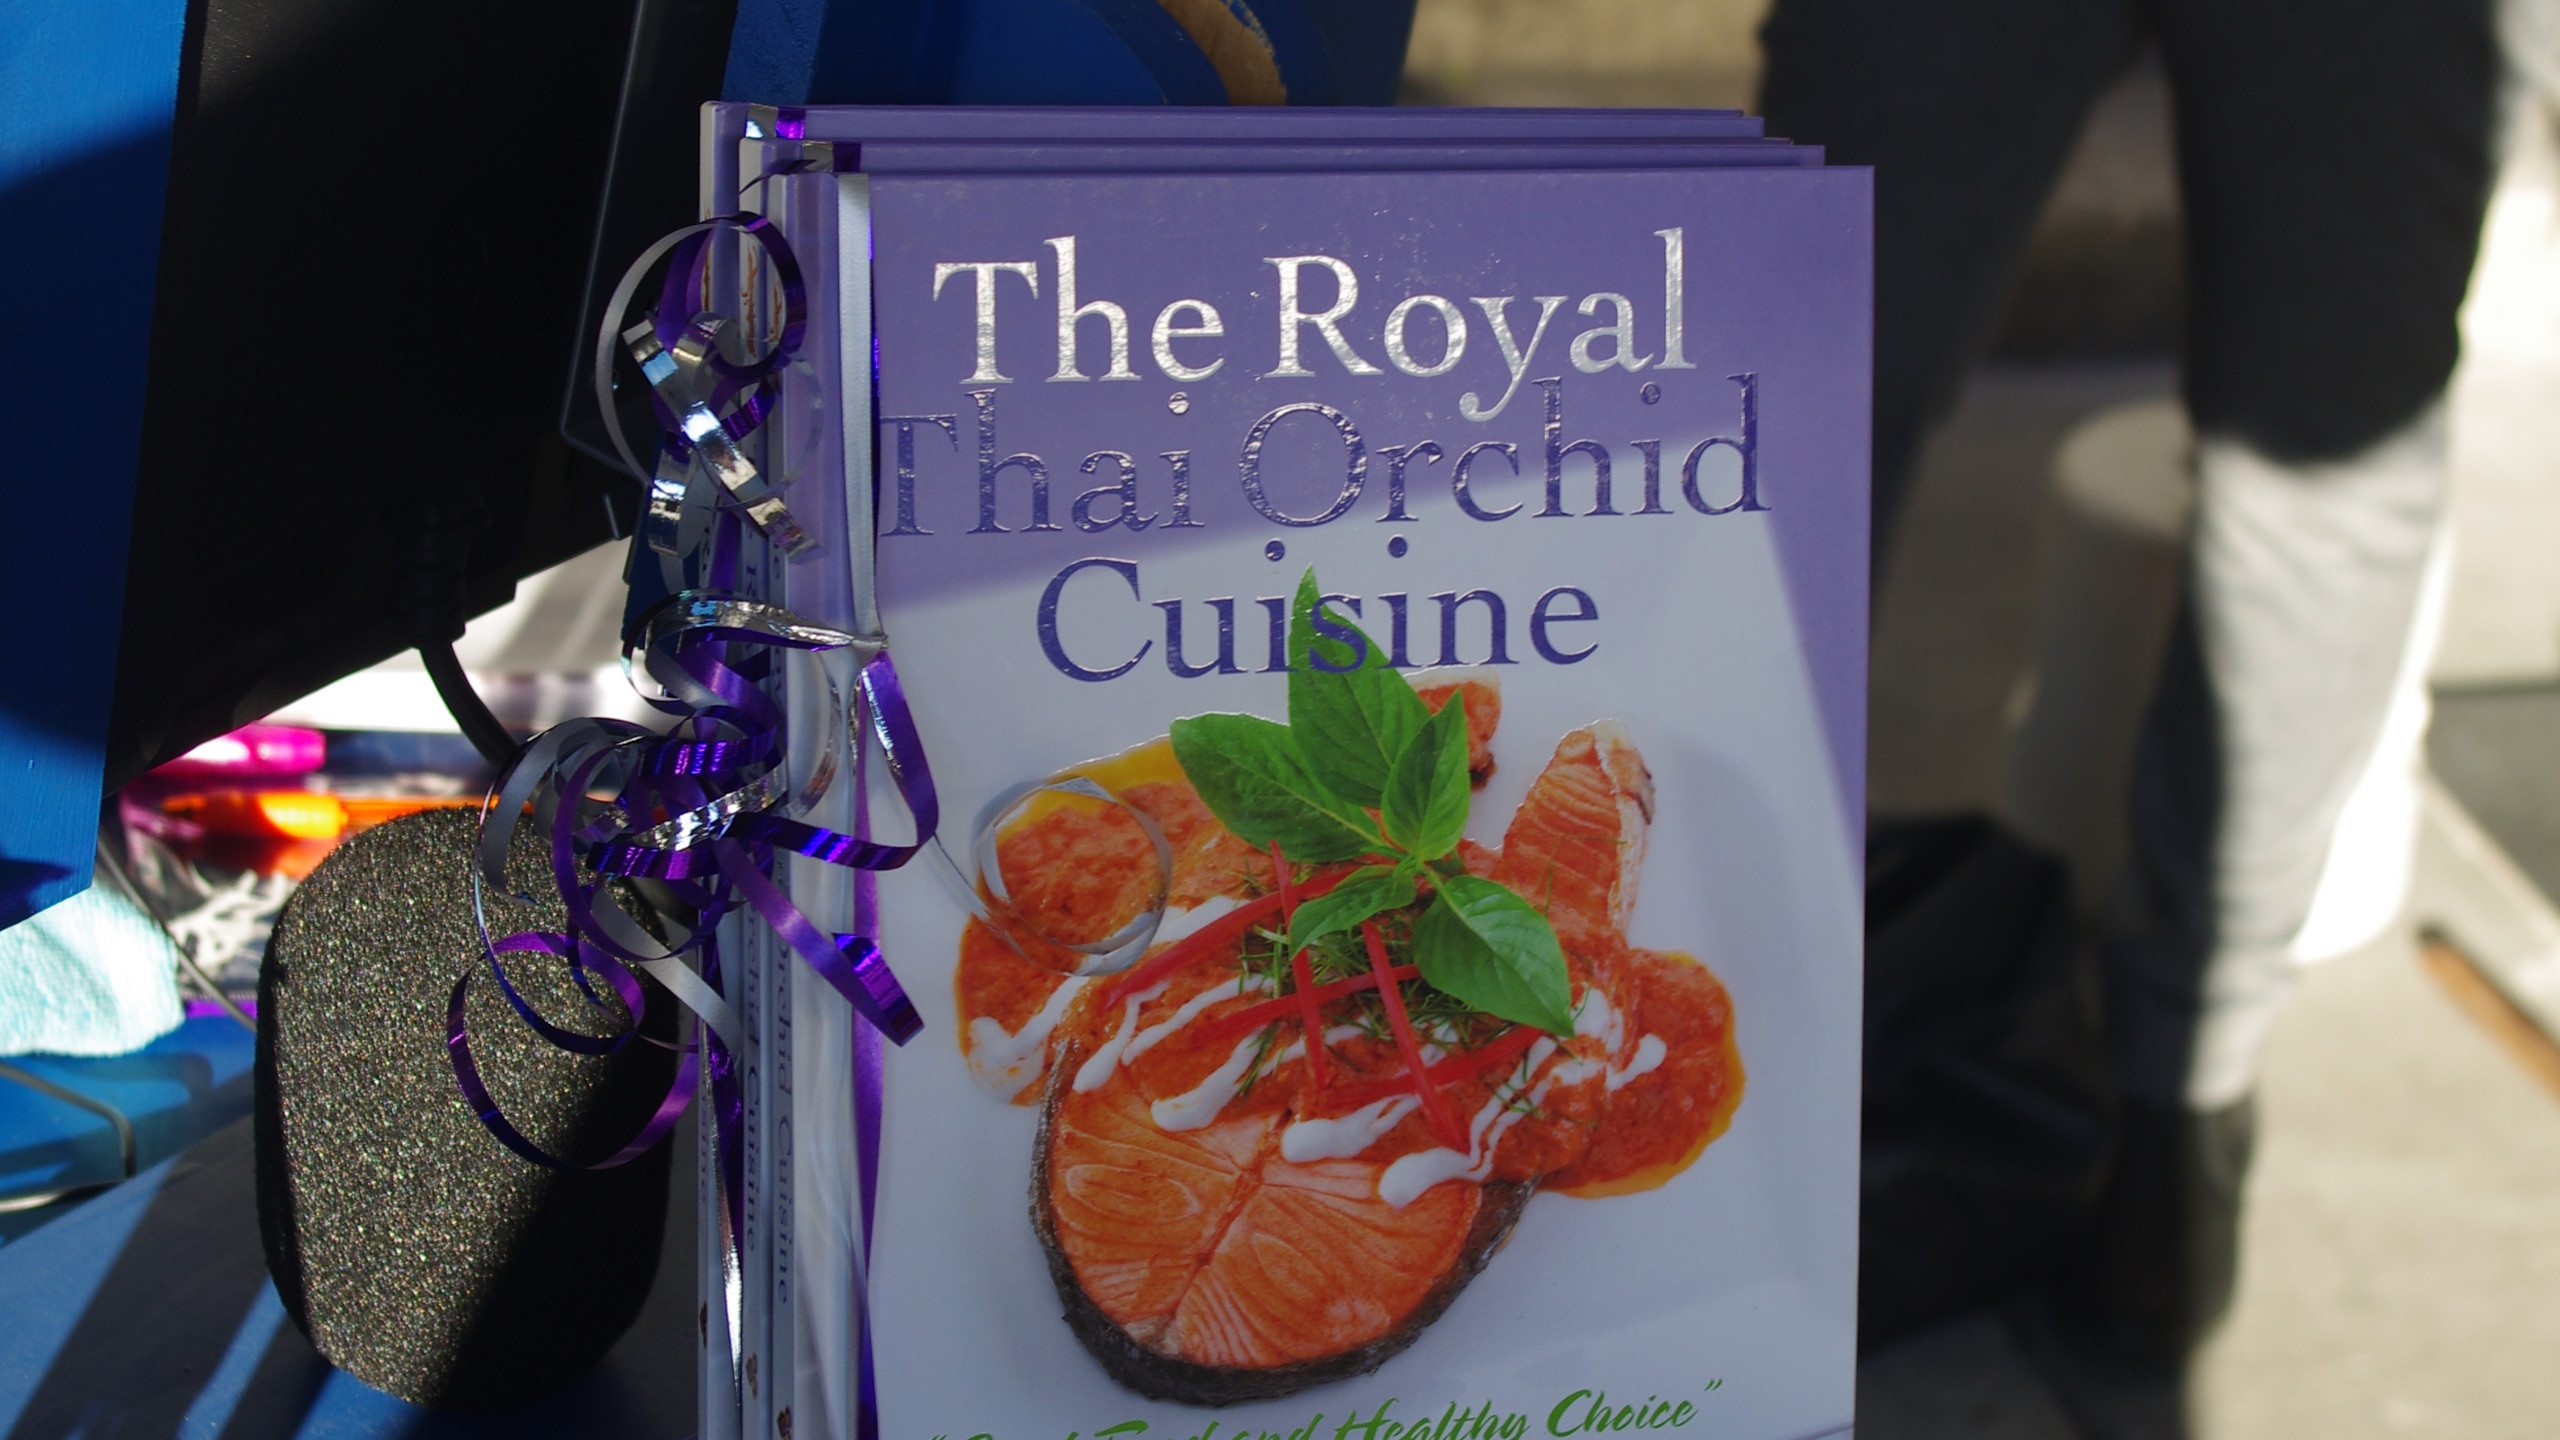 The Royal Thai Orchid Cuisine